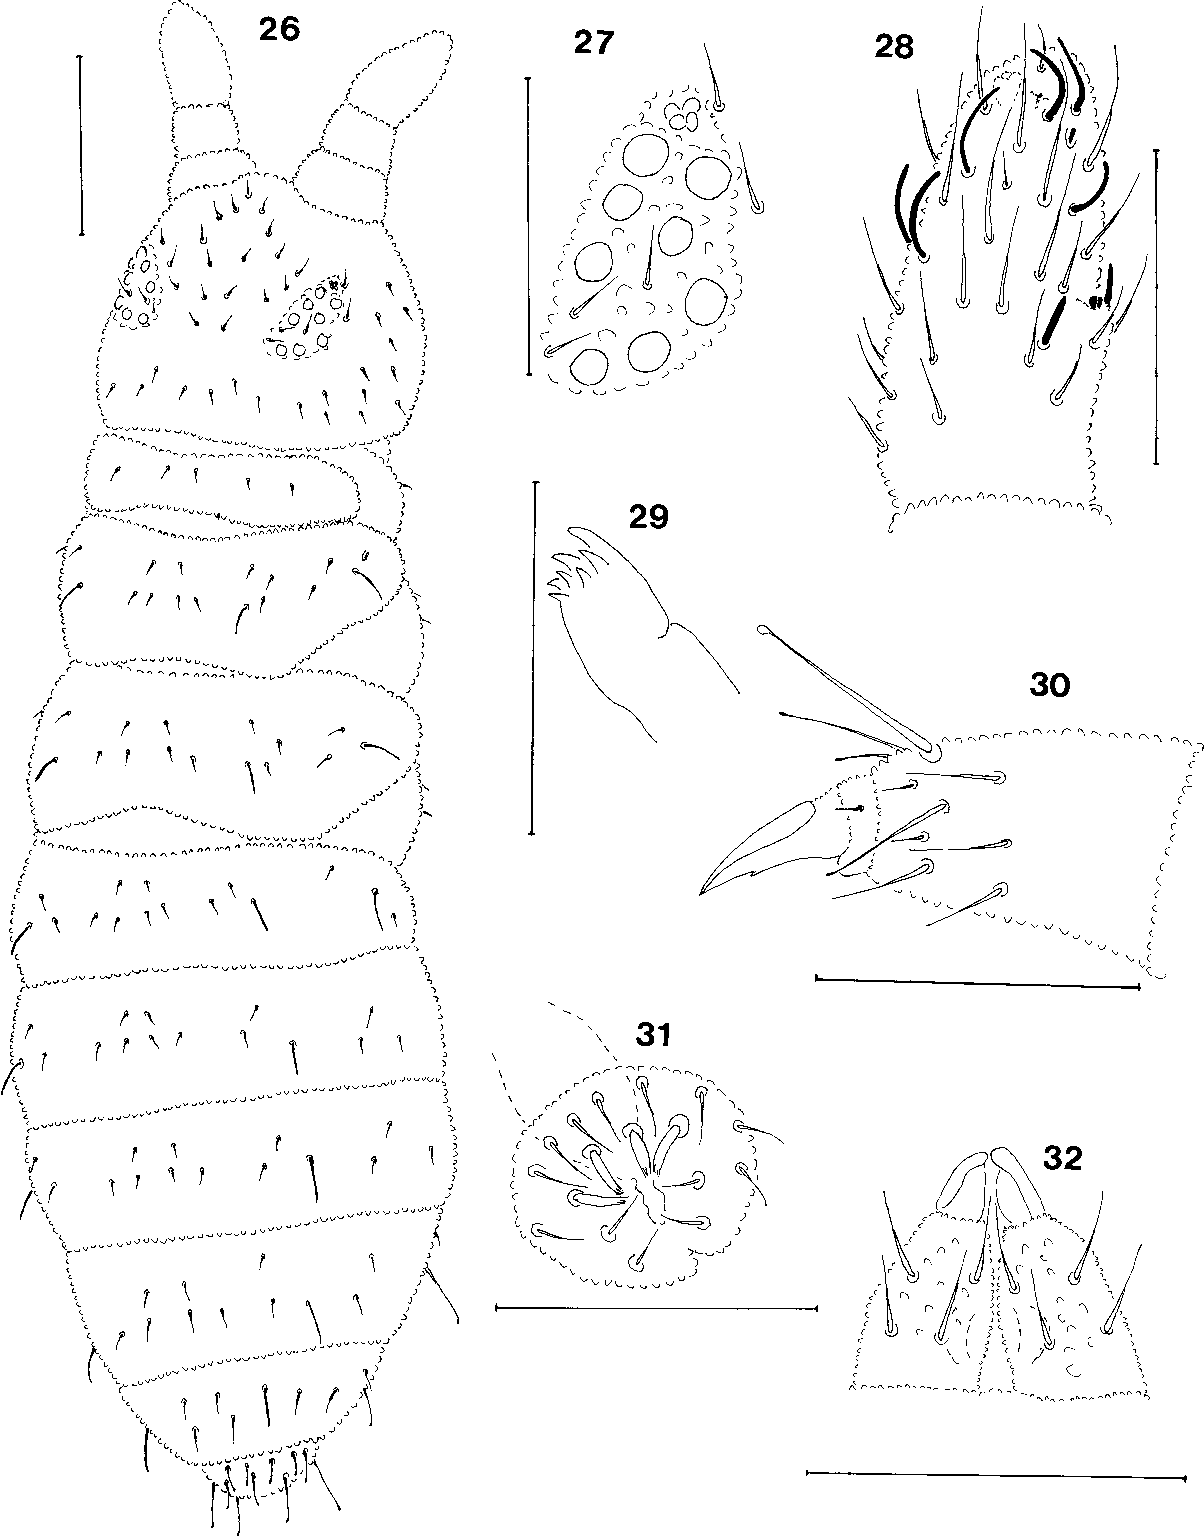 figure 26-32